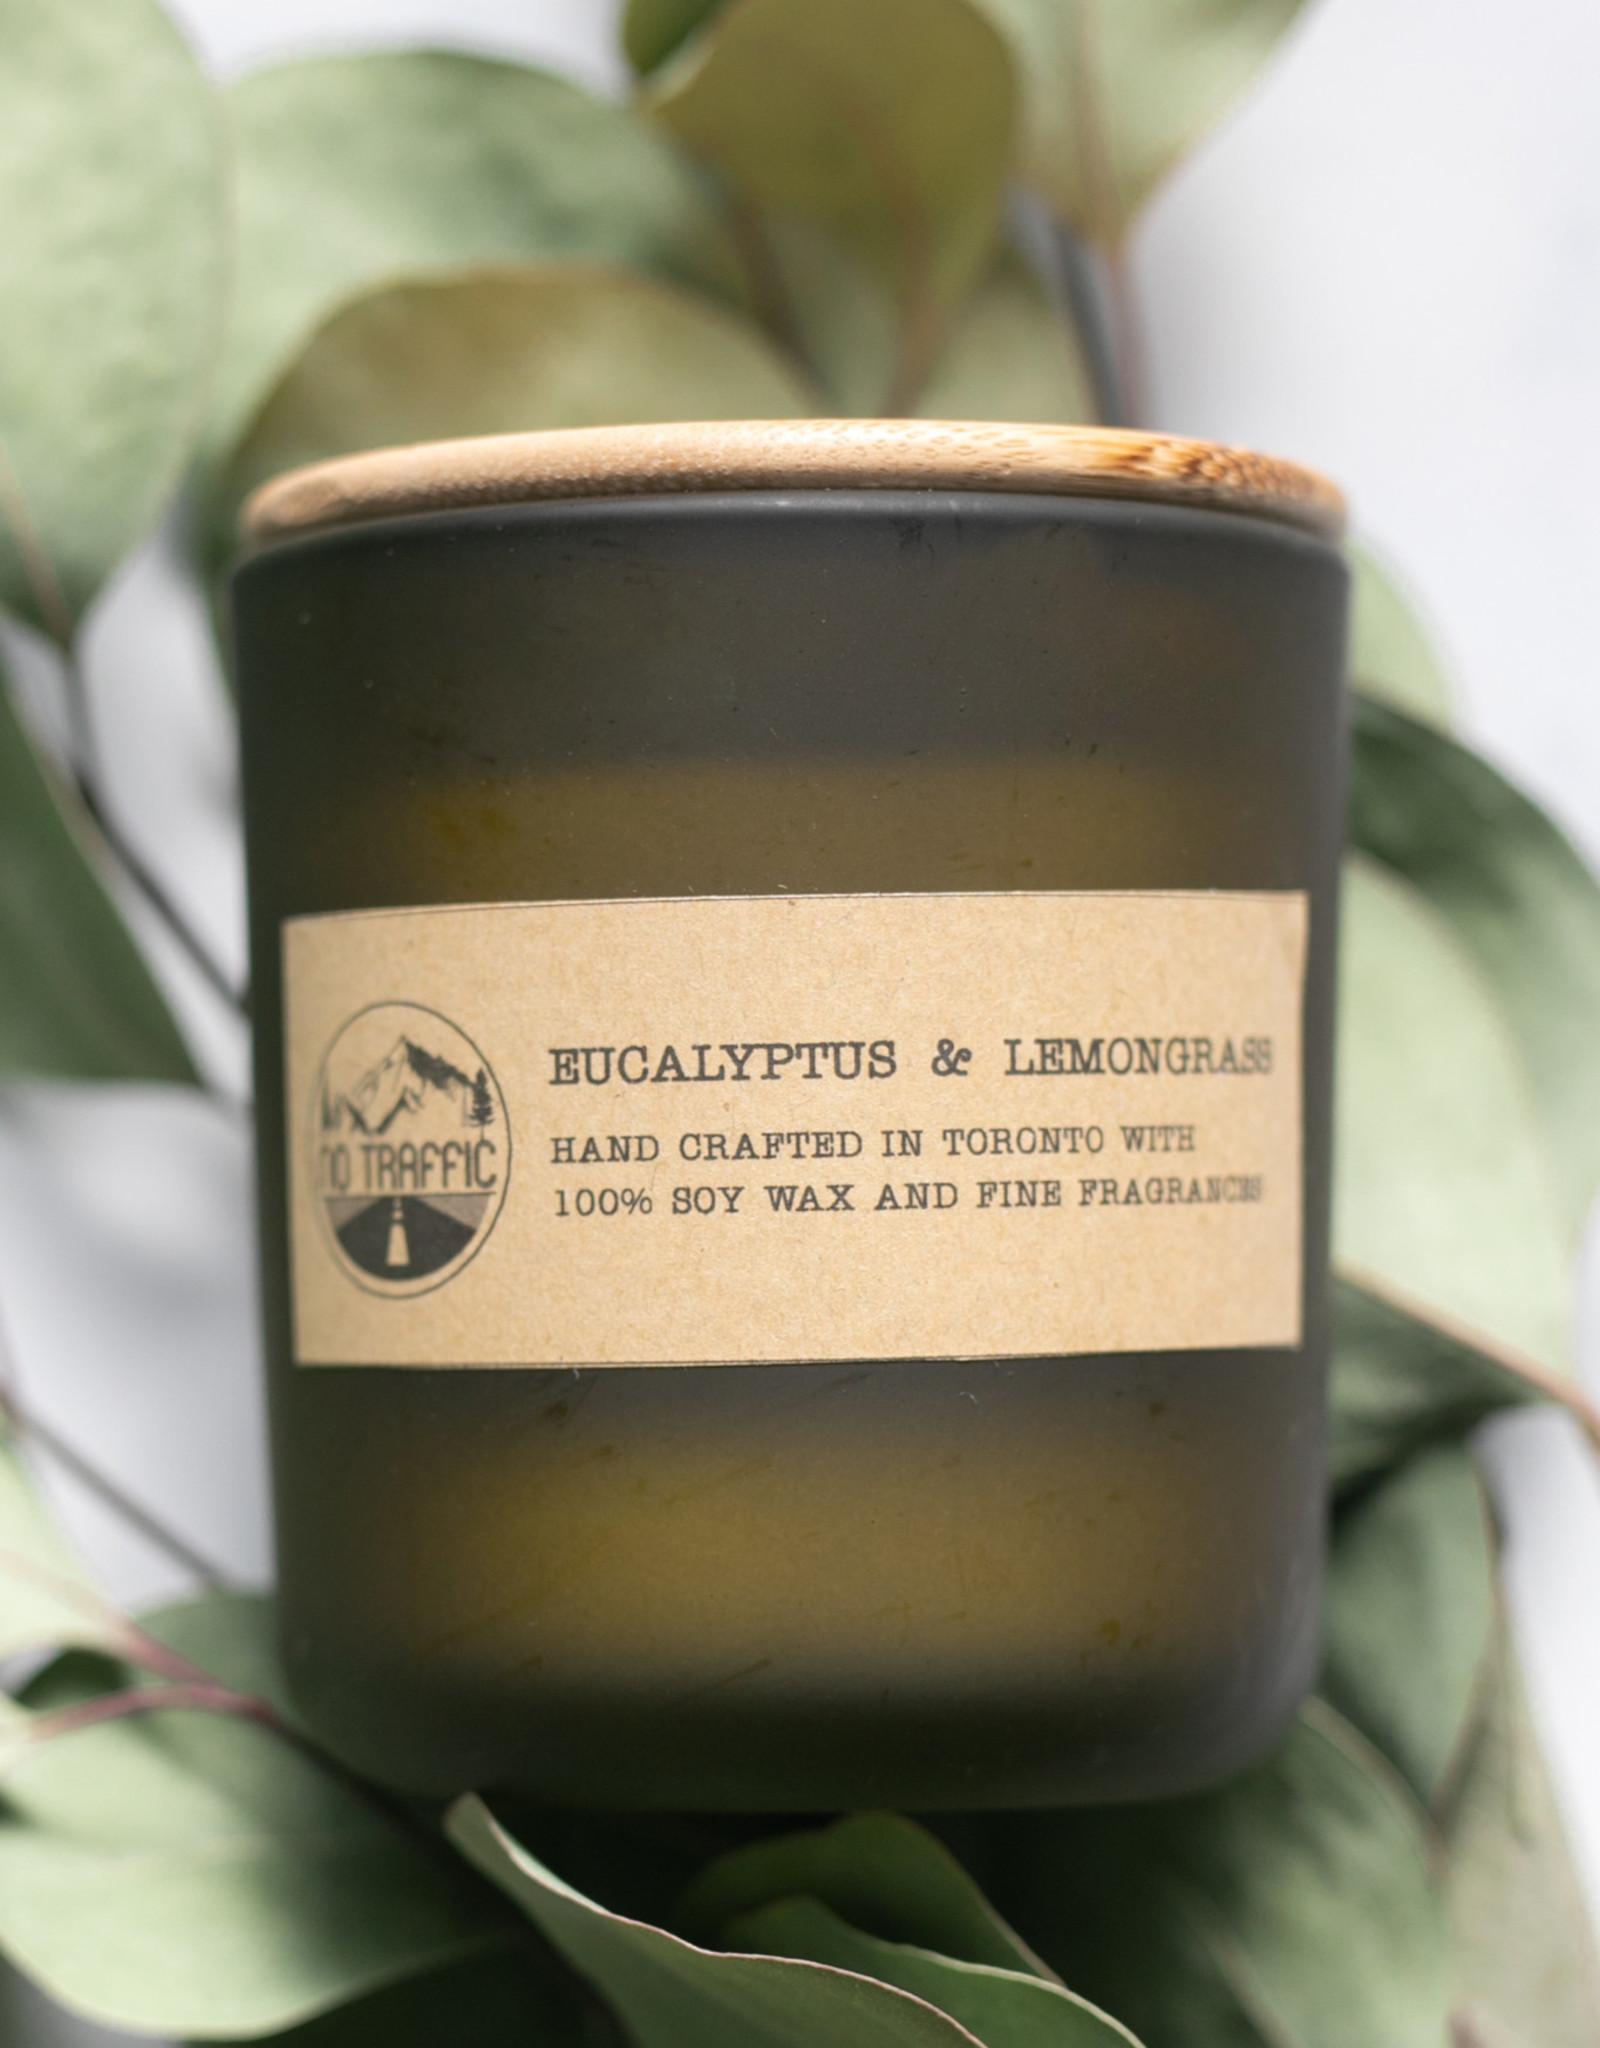 No Traffic No Traffic Spa Candle - Eucalyptus & Lemongrass